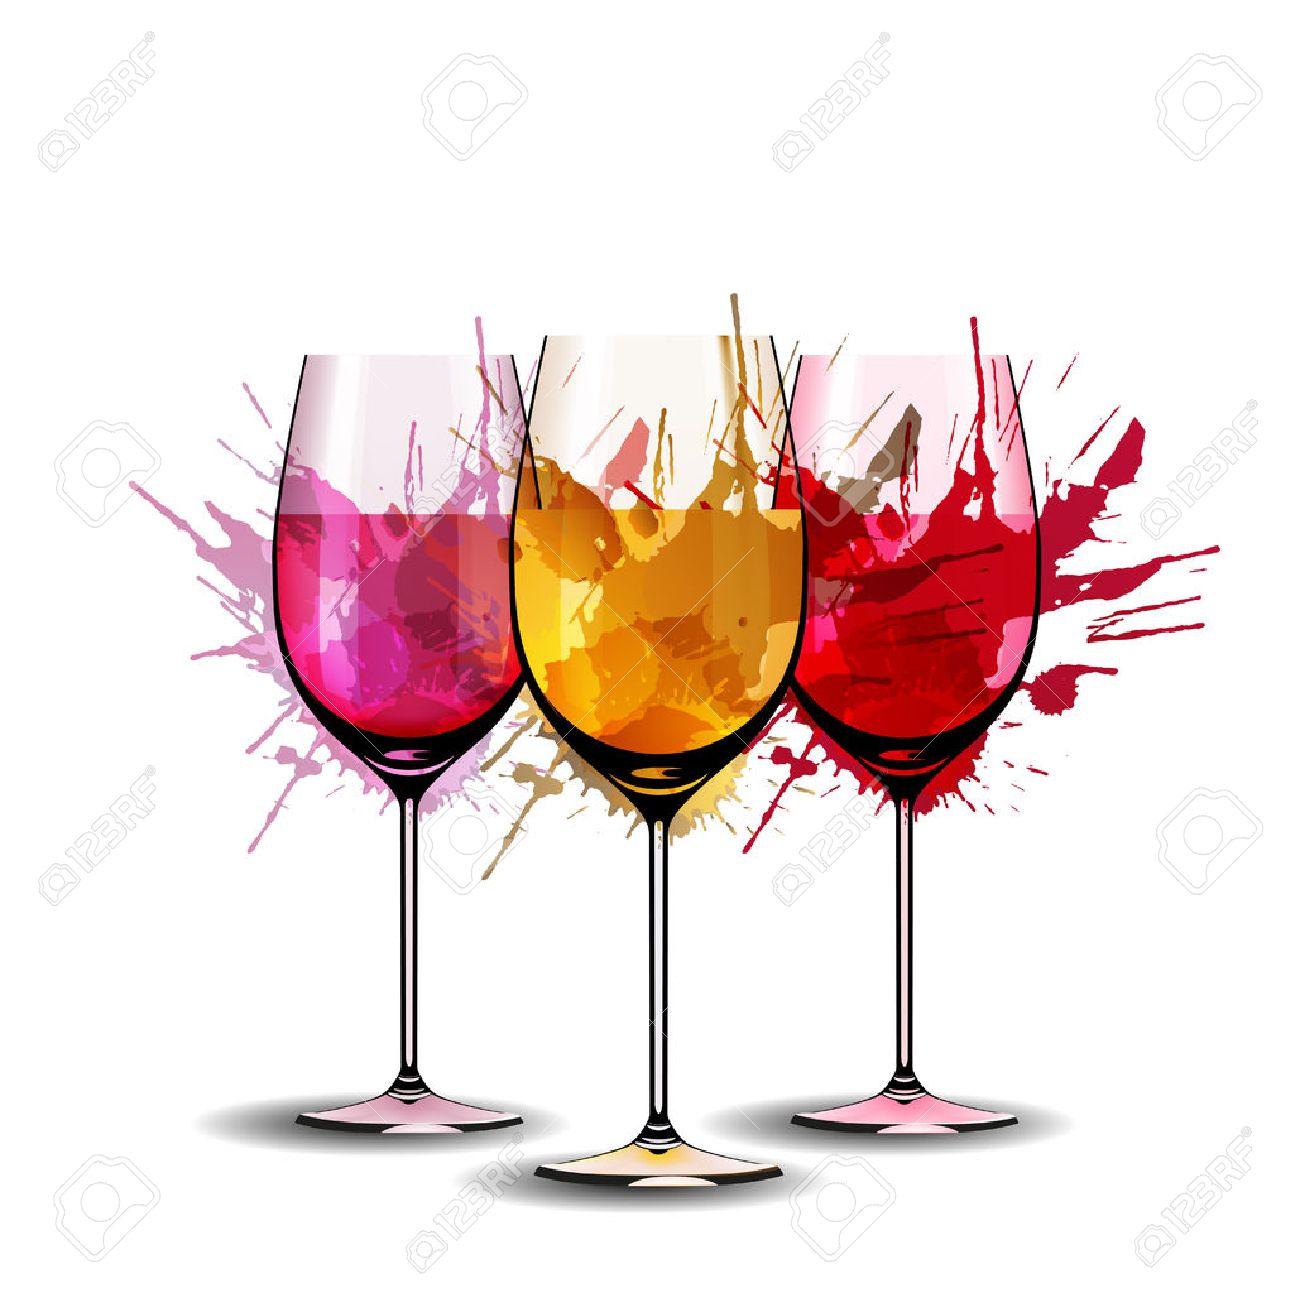 Three wine glasses with splashes - 24530874